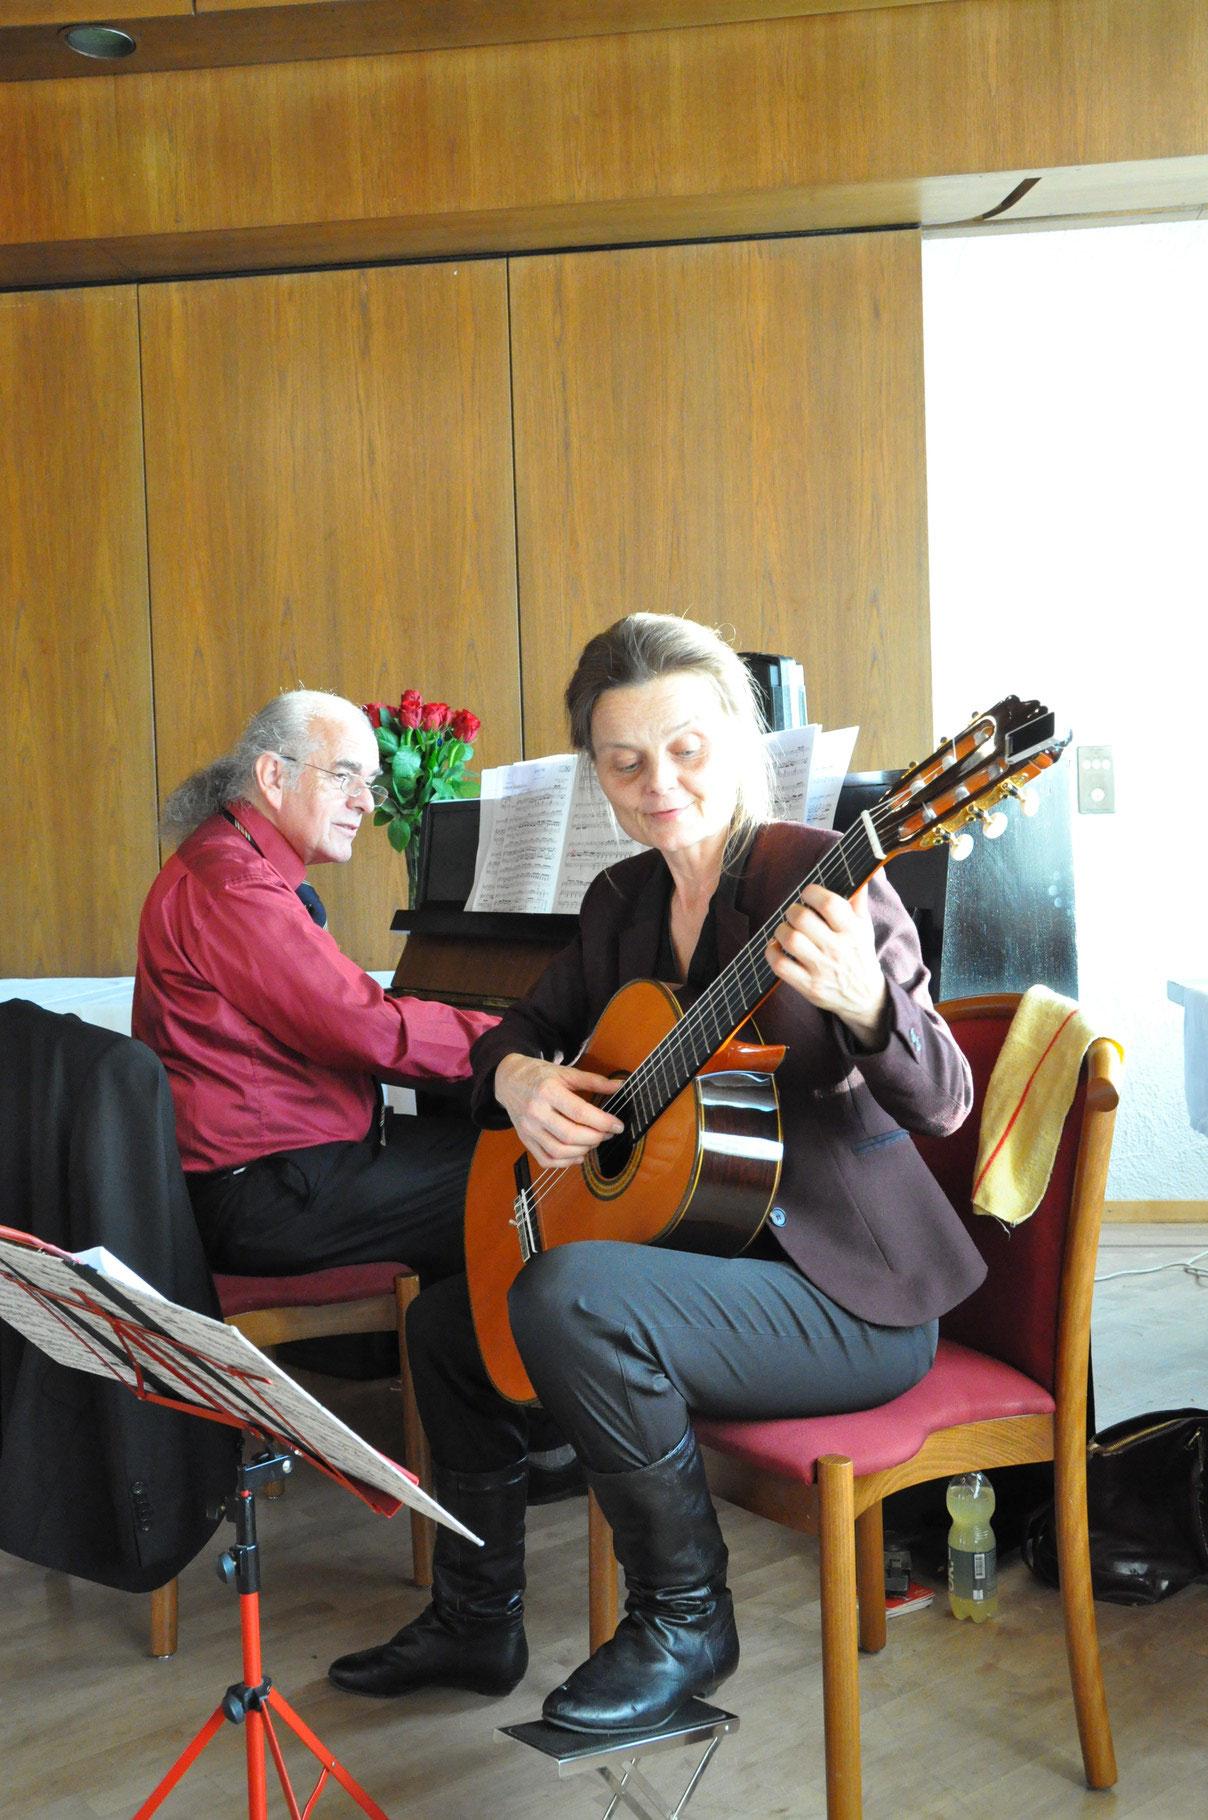 Kammermusik-Duo Regula Theus & Kurt Scheurer,  Astrologische Weihnachtsfeier 2015